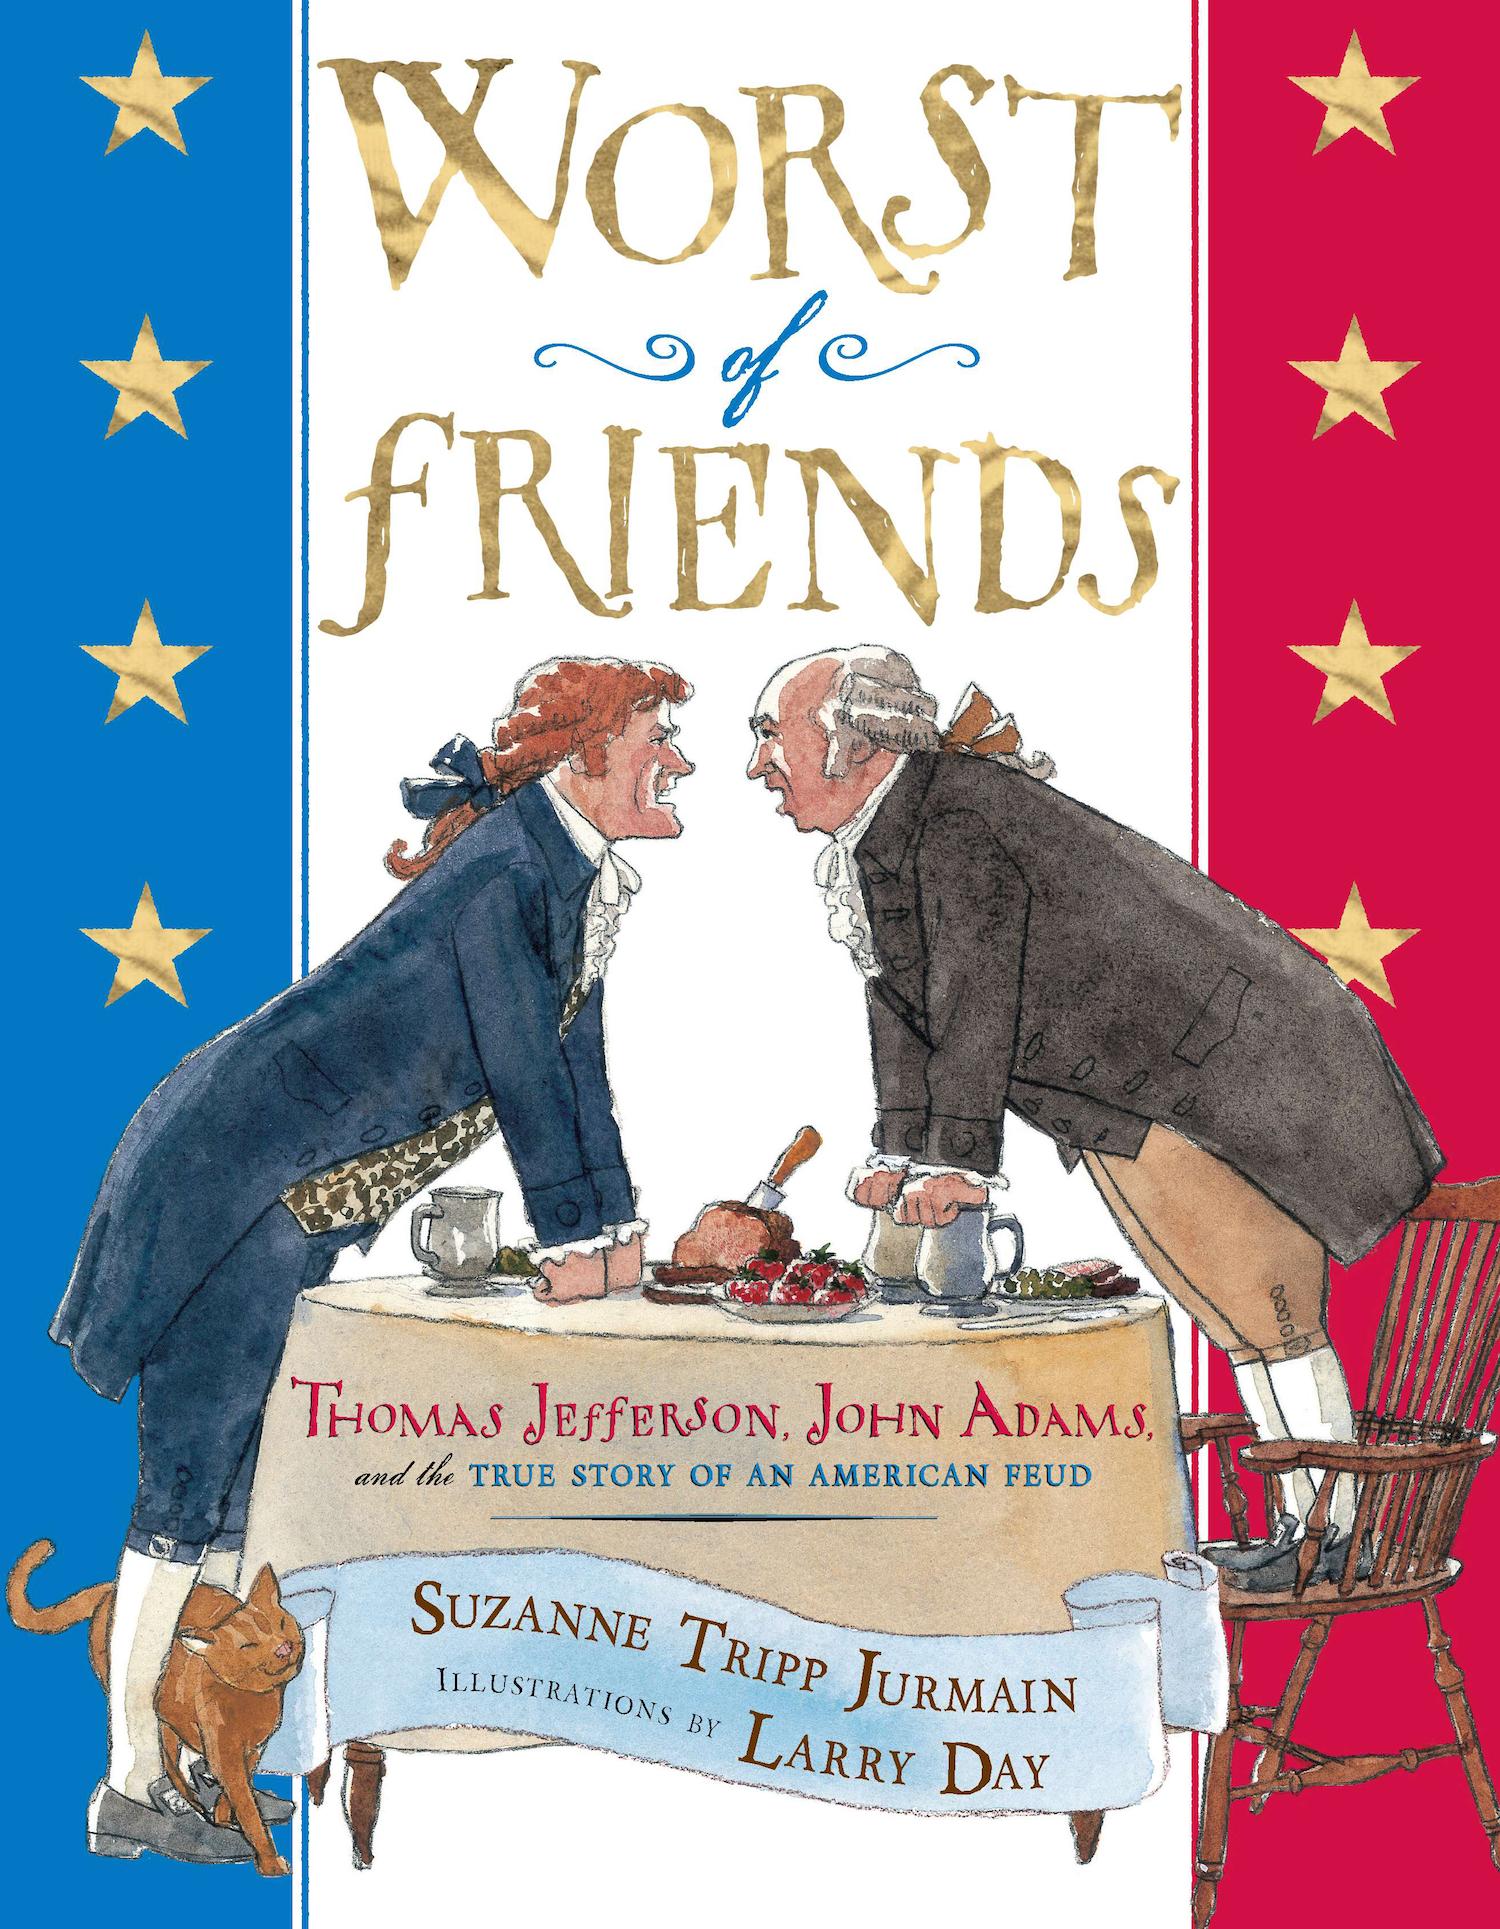 15 Best Nonfiction Books for Kids - Best Children's True